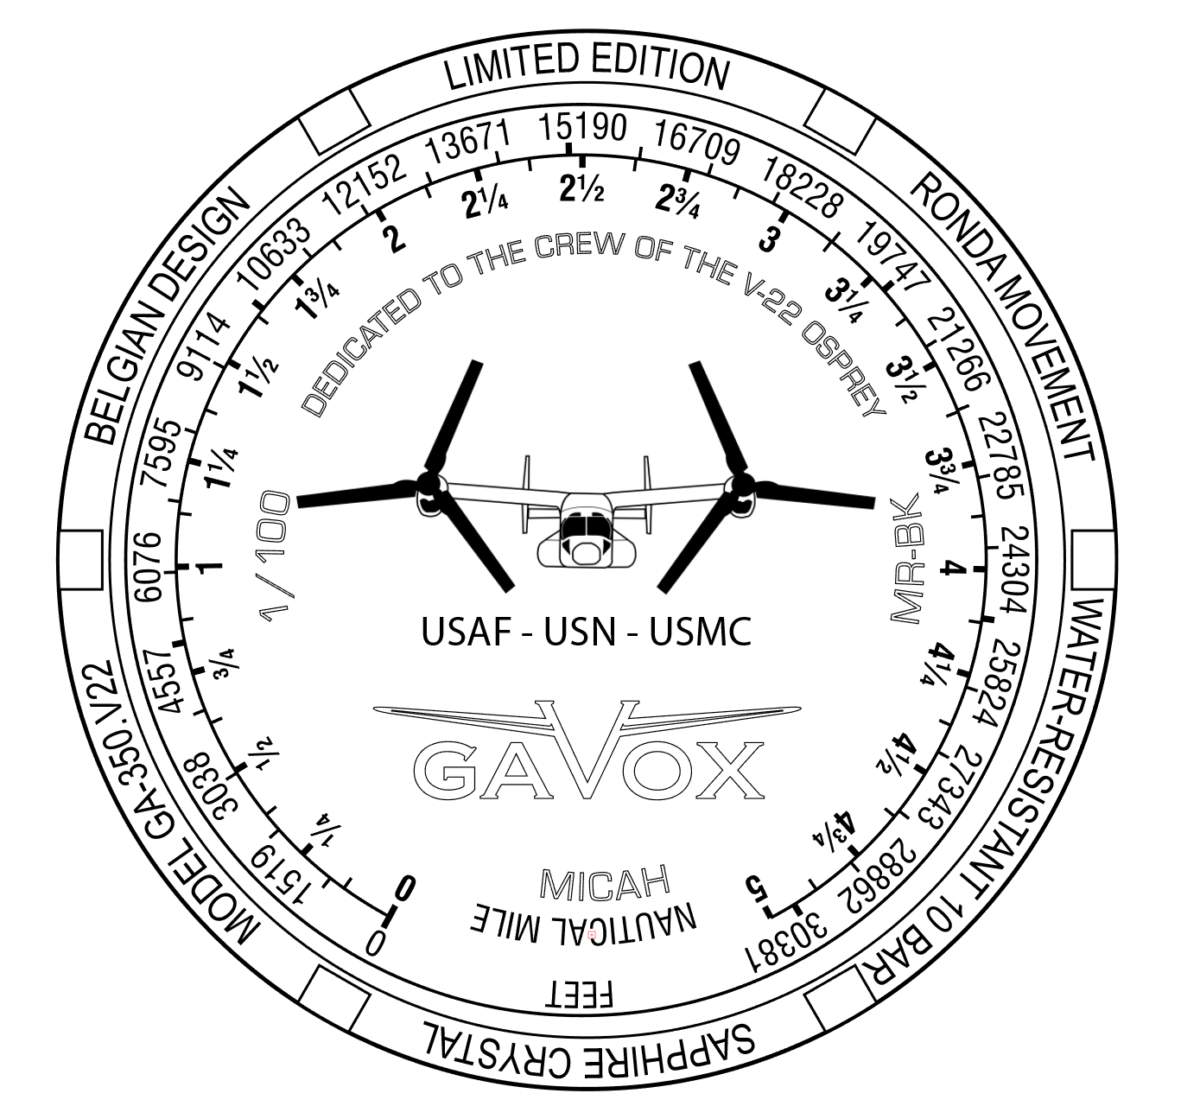 Gavox-caseback image